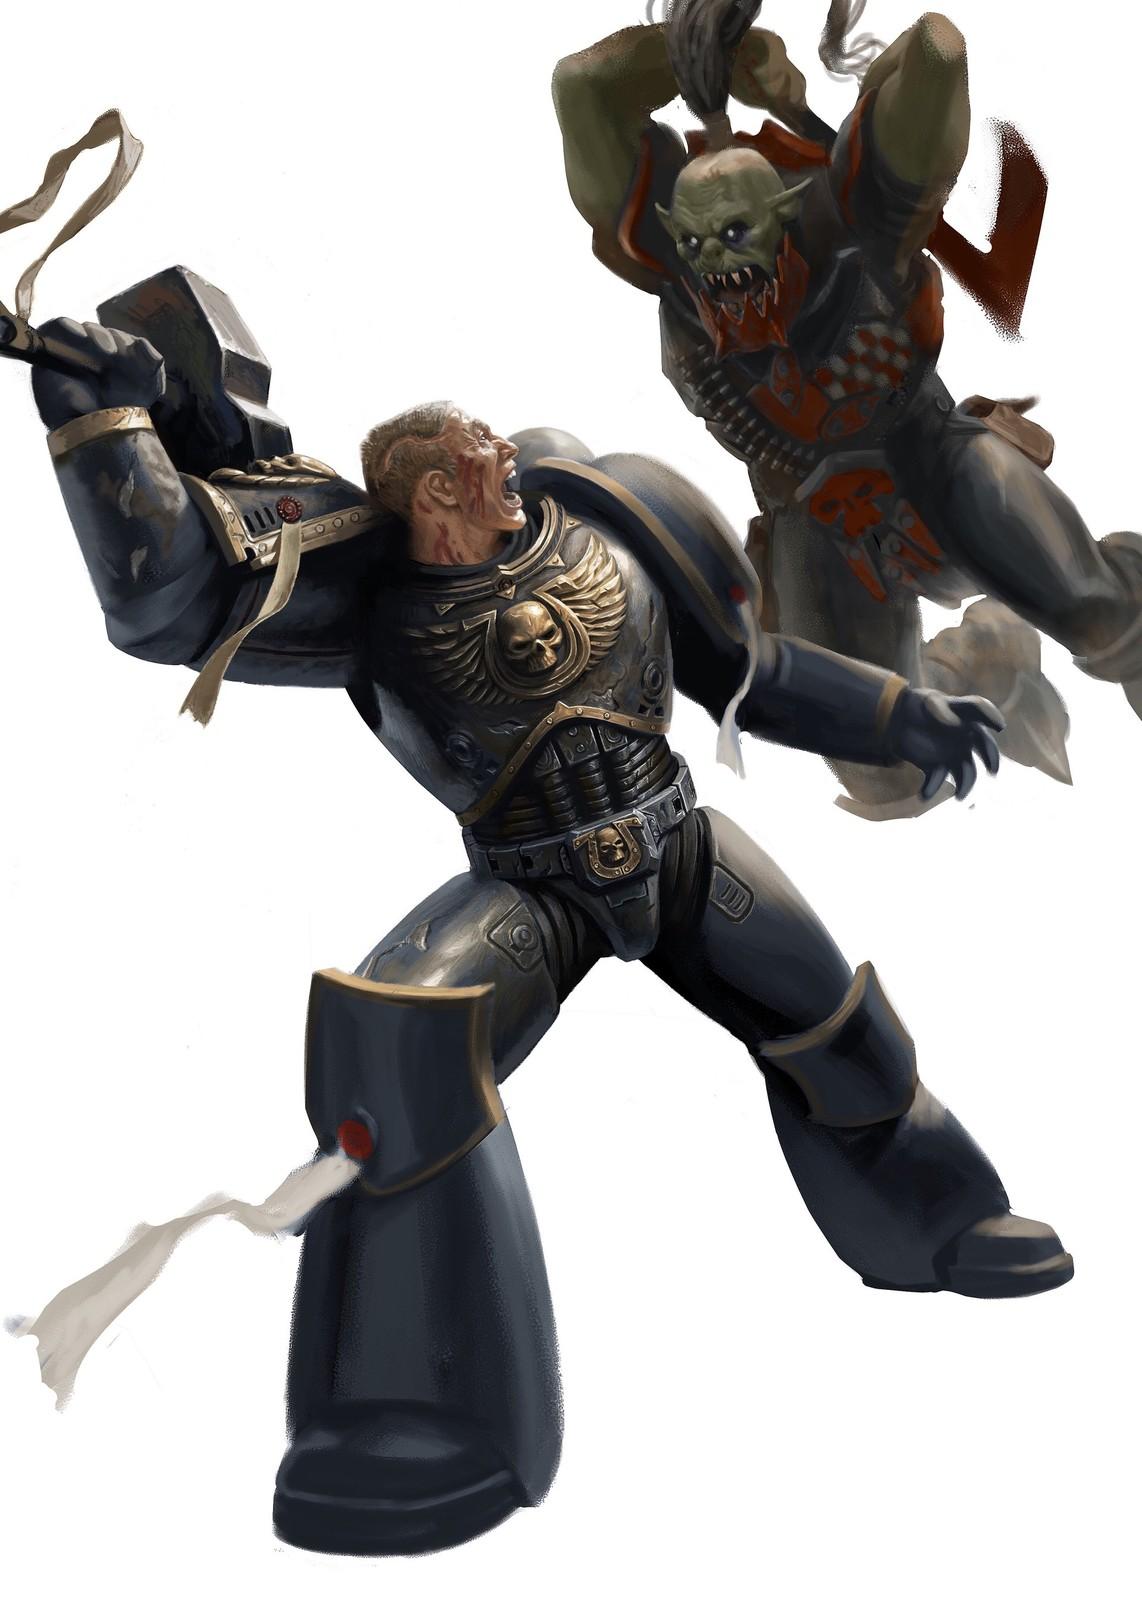 Rough design for Warhammer 40K